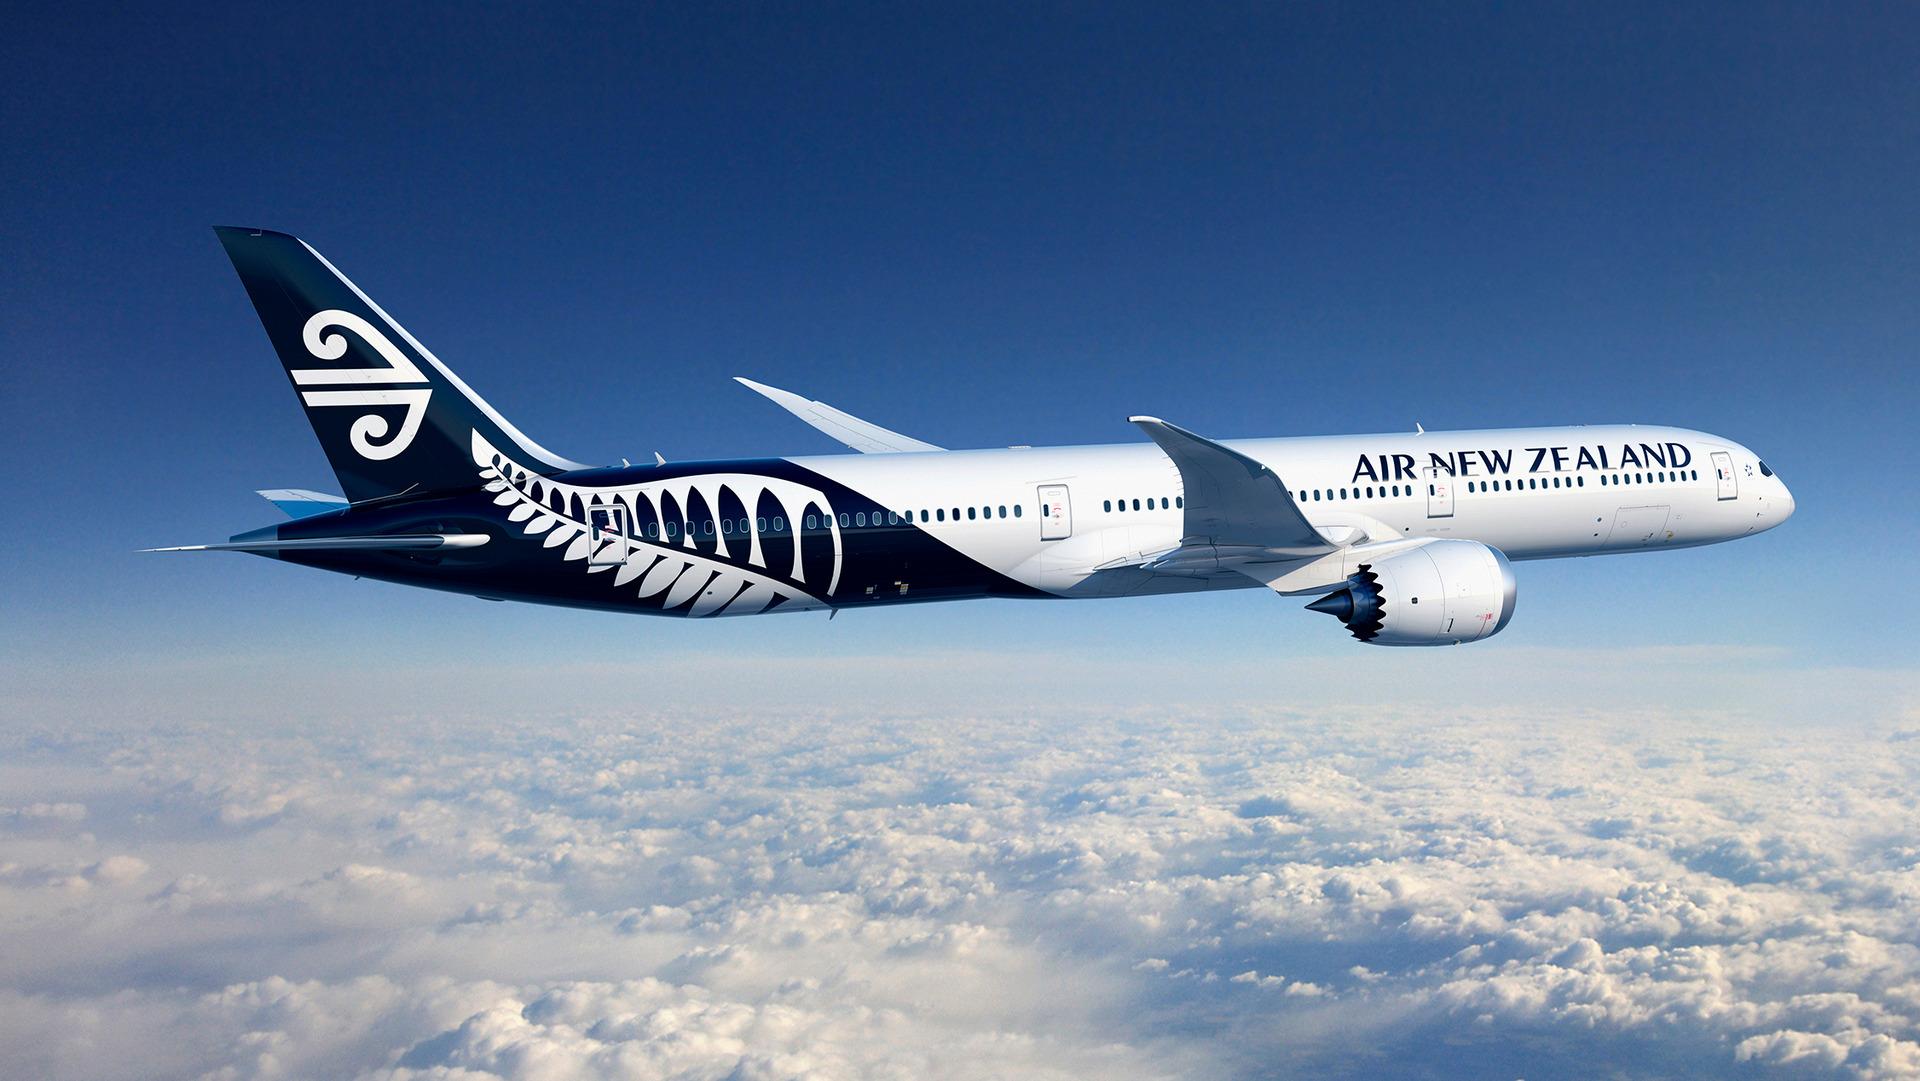 Air NZ axes London flights, launches Auckland-New York service